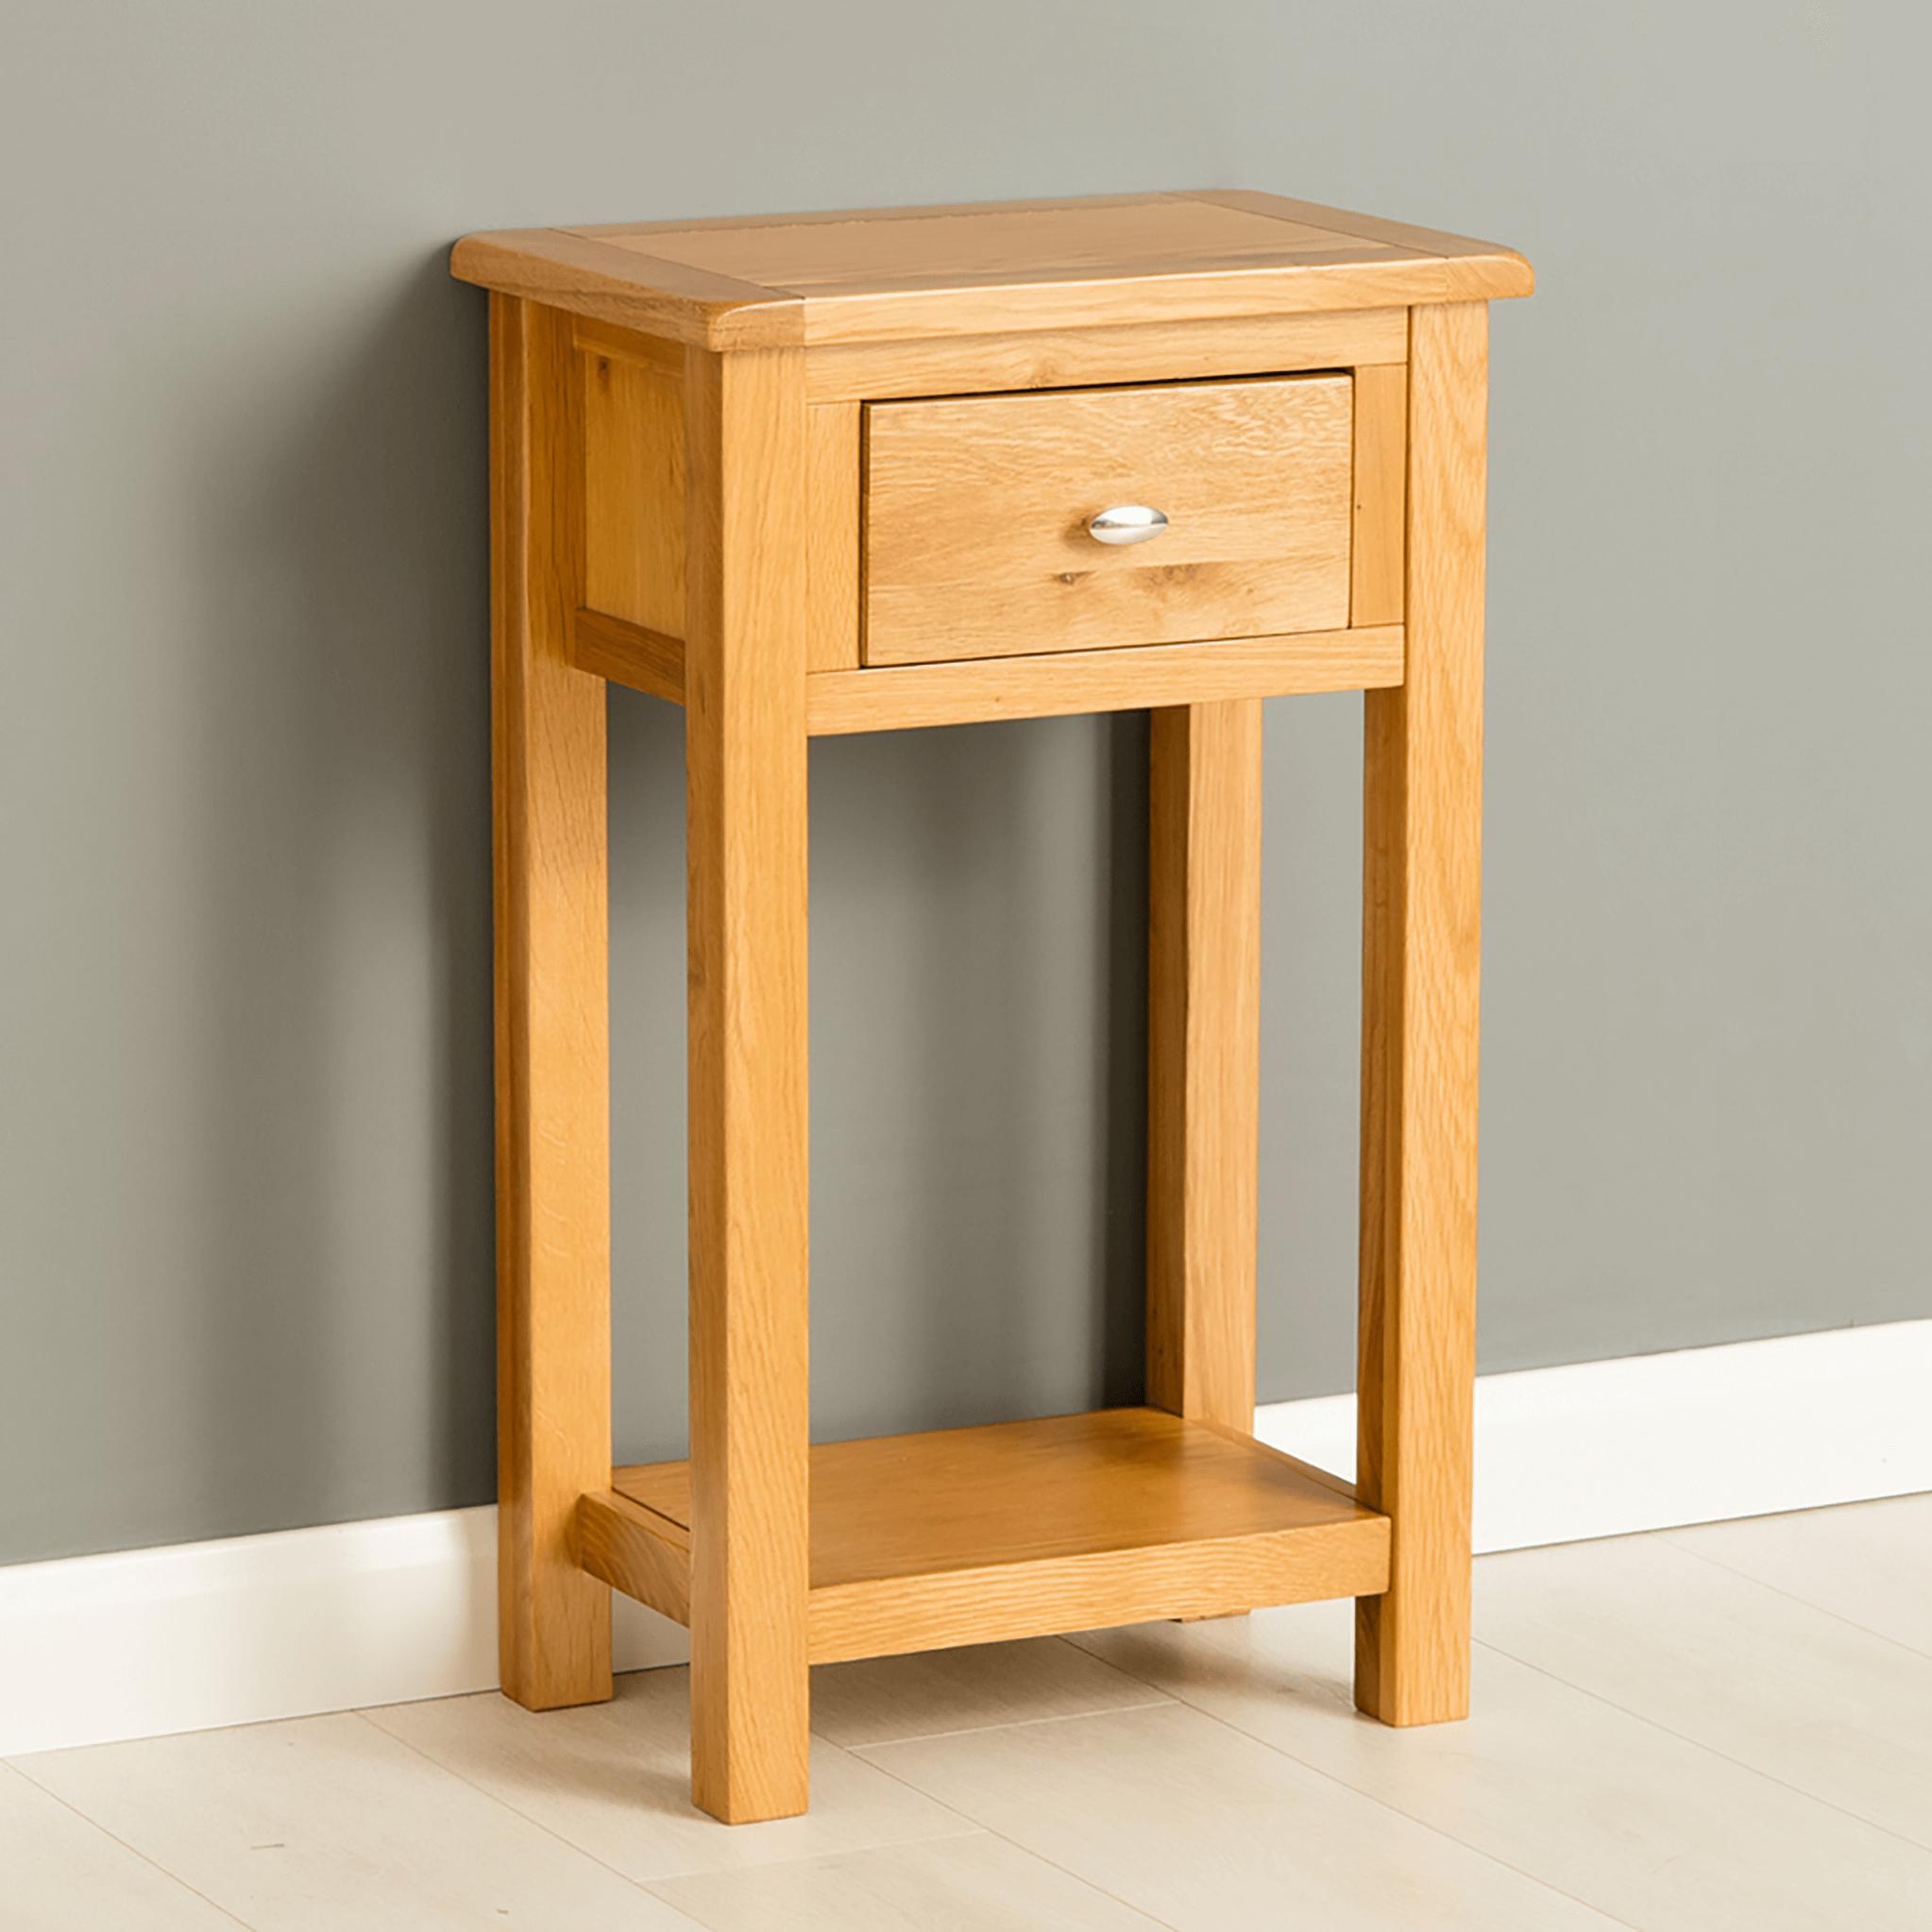 Poldark Oak Telephone Table | 24 Furniture Store : Great Inside Sherbourne Oak Corner Tv Stands (View 15 of 20)